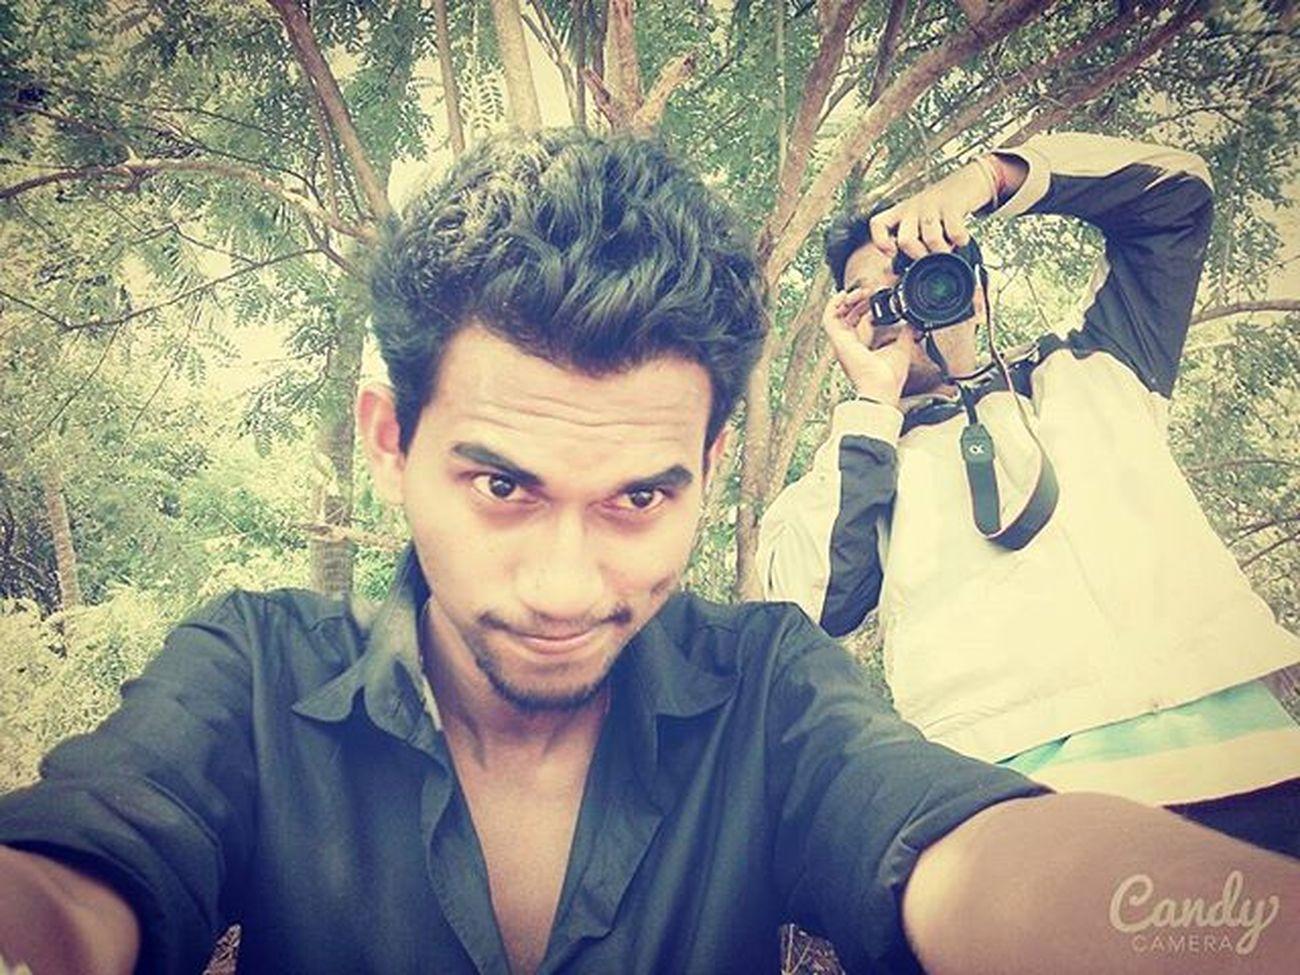 Selfiee Capture Northgoa Sirdao Awsmtym Njoyd ... :)